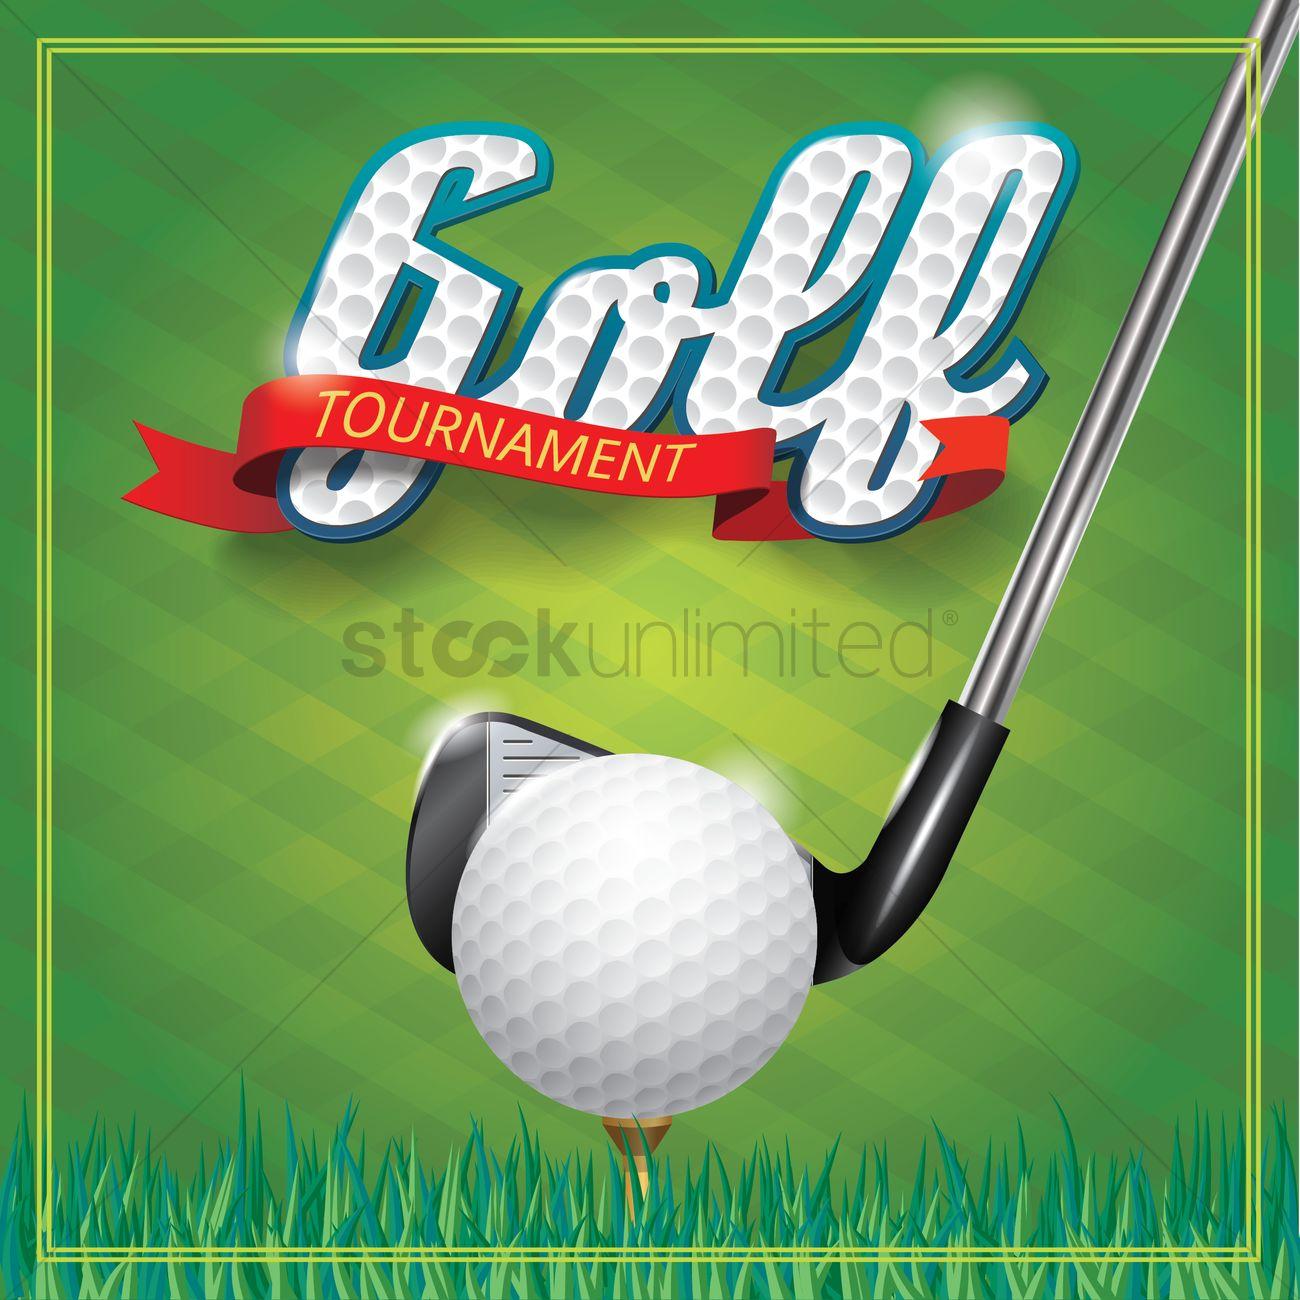 Golf tournament invitation vector image 1497627 stockunlimited golf tournament invitation vector graphic stopboris Choice Image